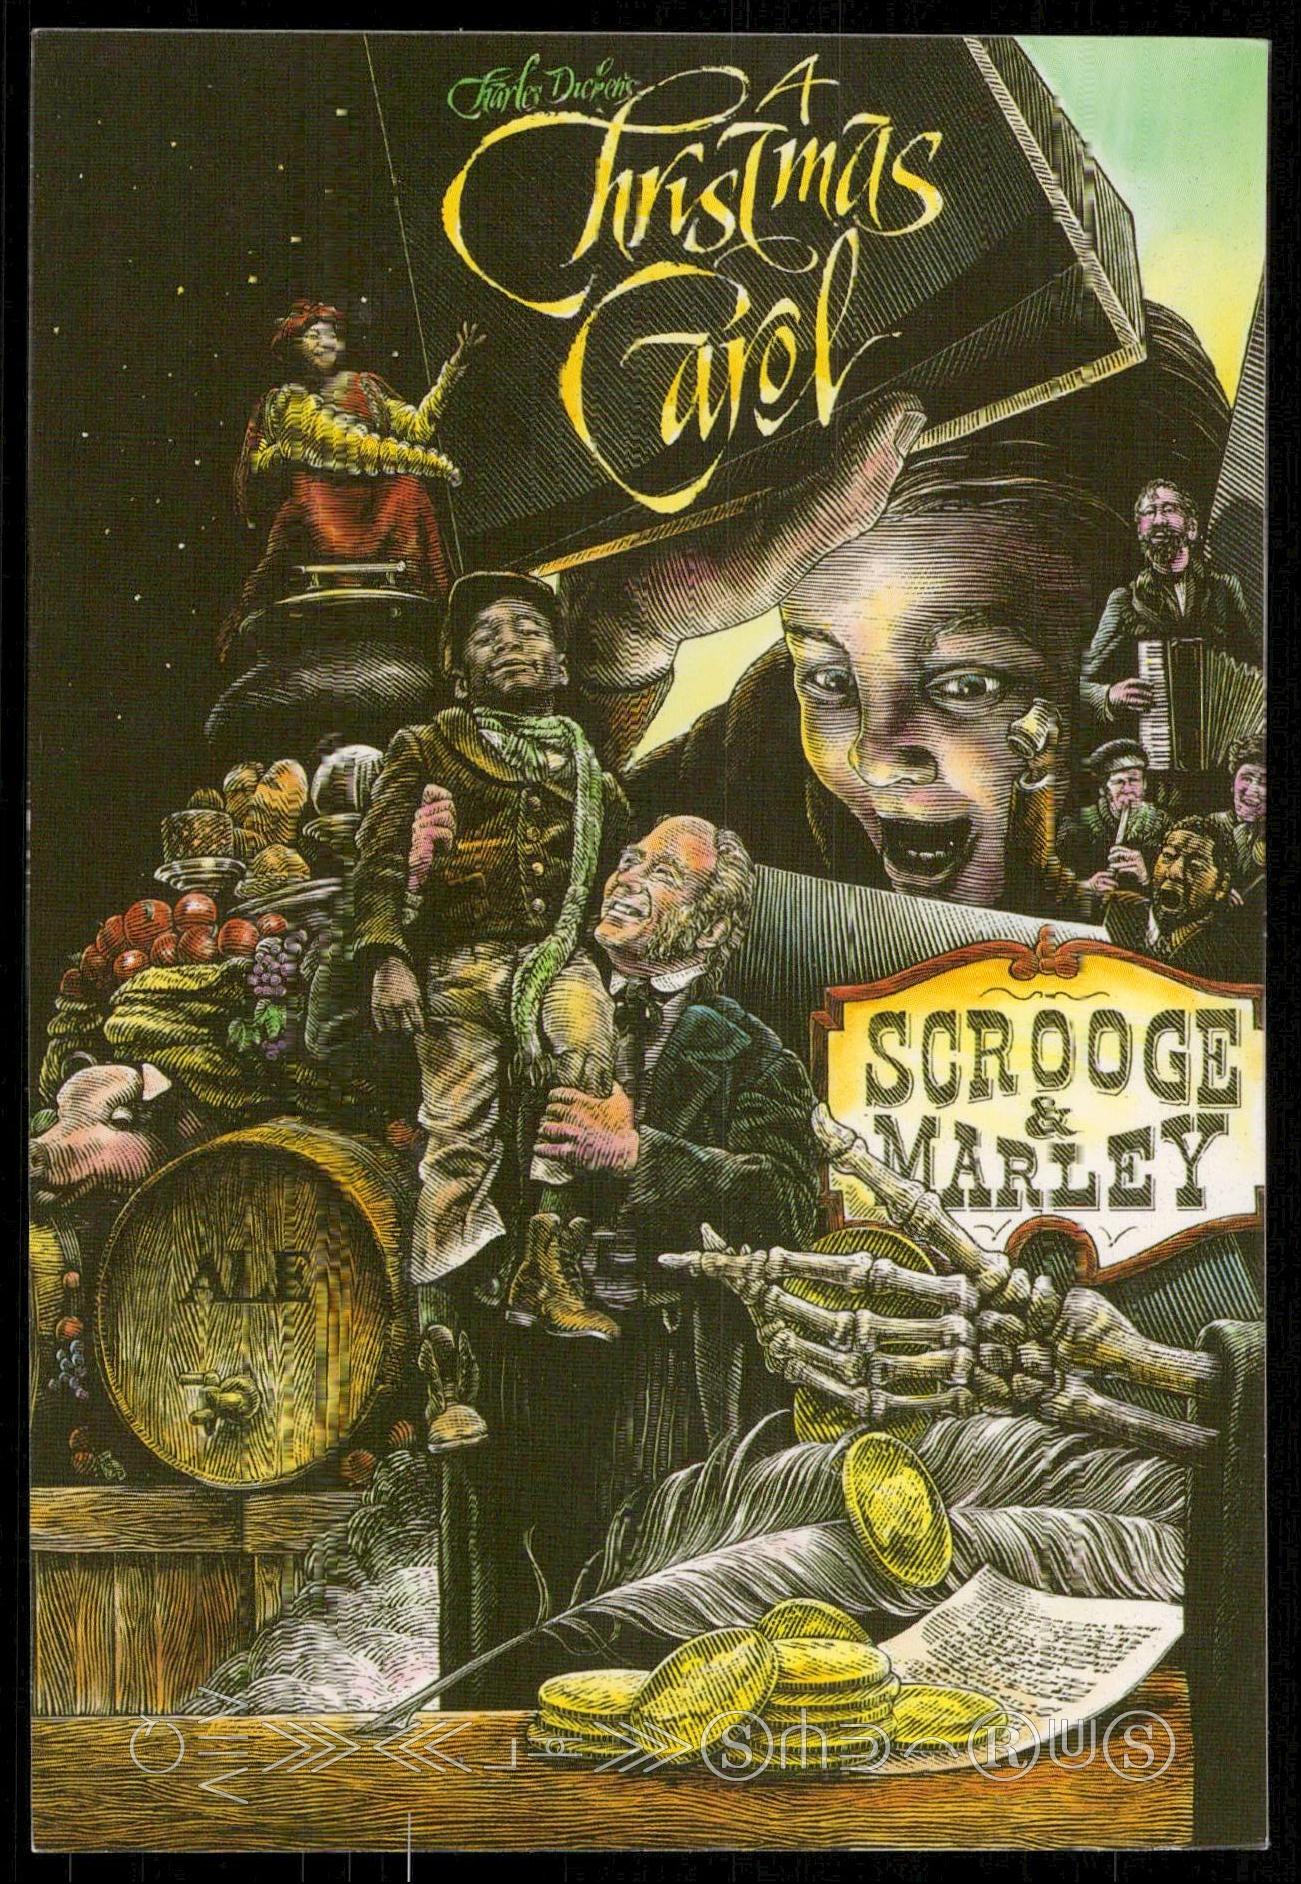 A Christmas Carol Scrooge And Marley.Charles Dickens Christmas Carol Scrooge Marley Hippostcard